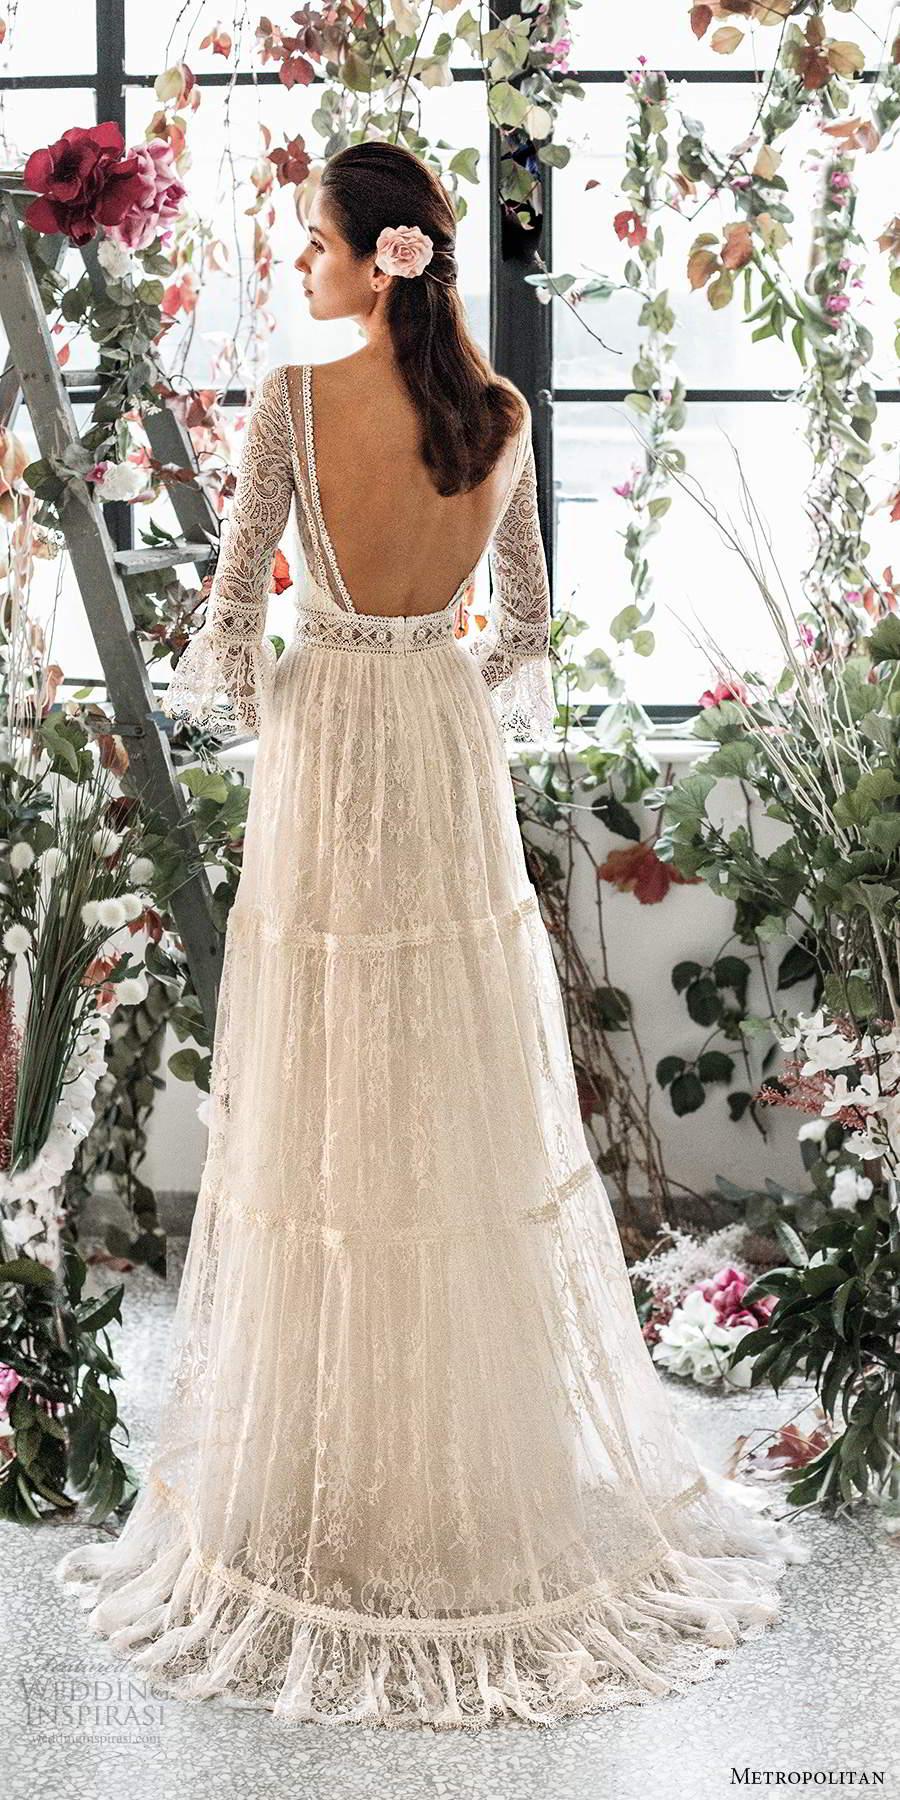 metropolitan spring 2020 bridal 3 quarter bell sleeves illusion bateau neck sweetheart neckline fully embellished lace a line boho chic wedding dress open back sweep train (8) bv